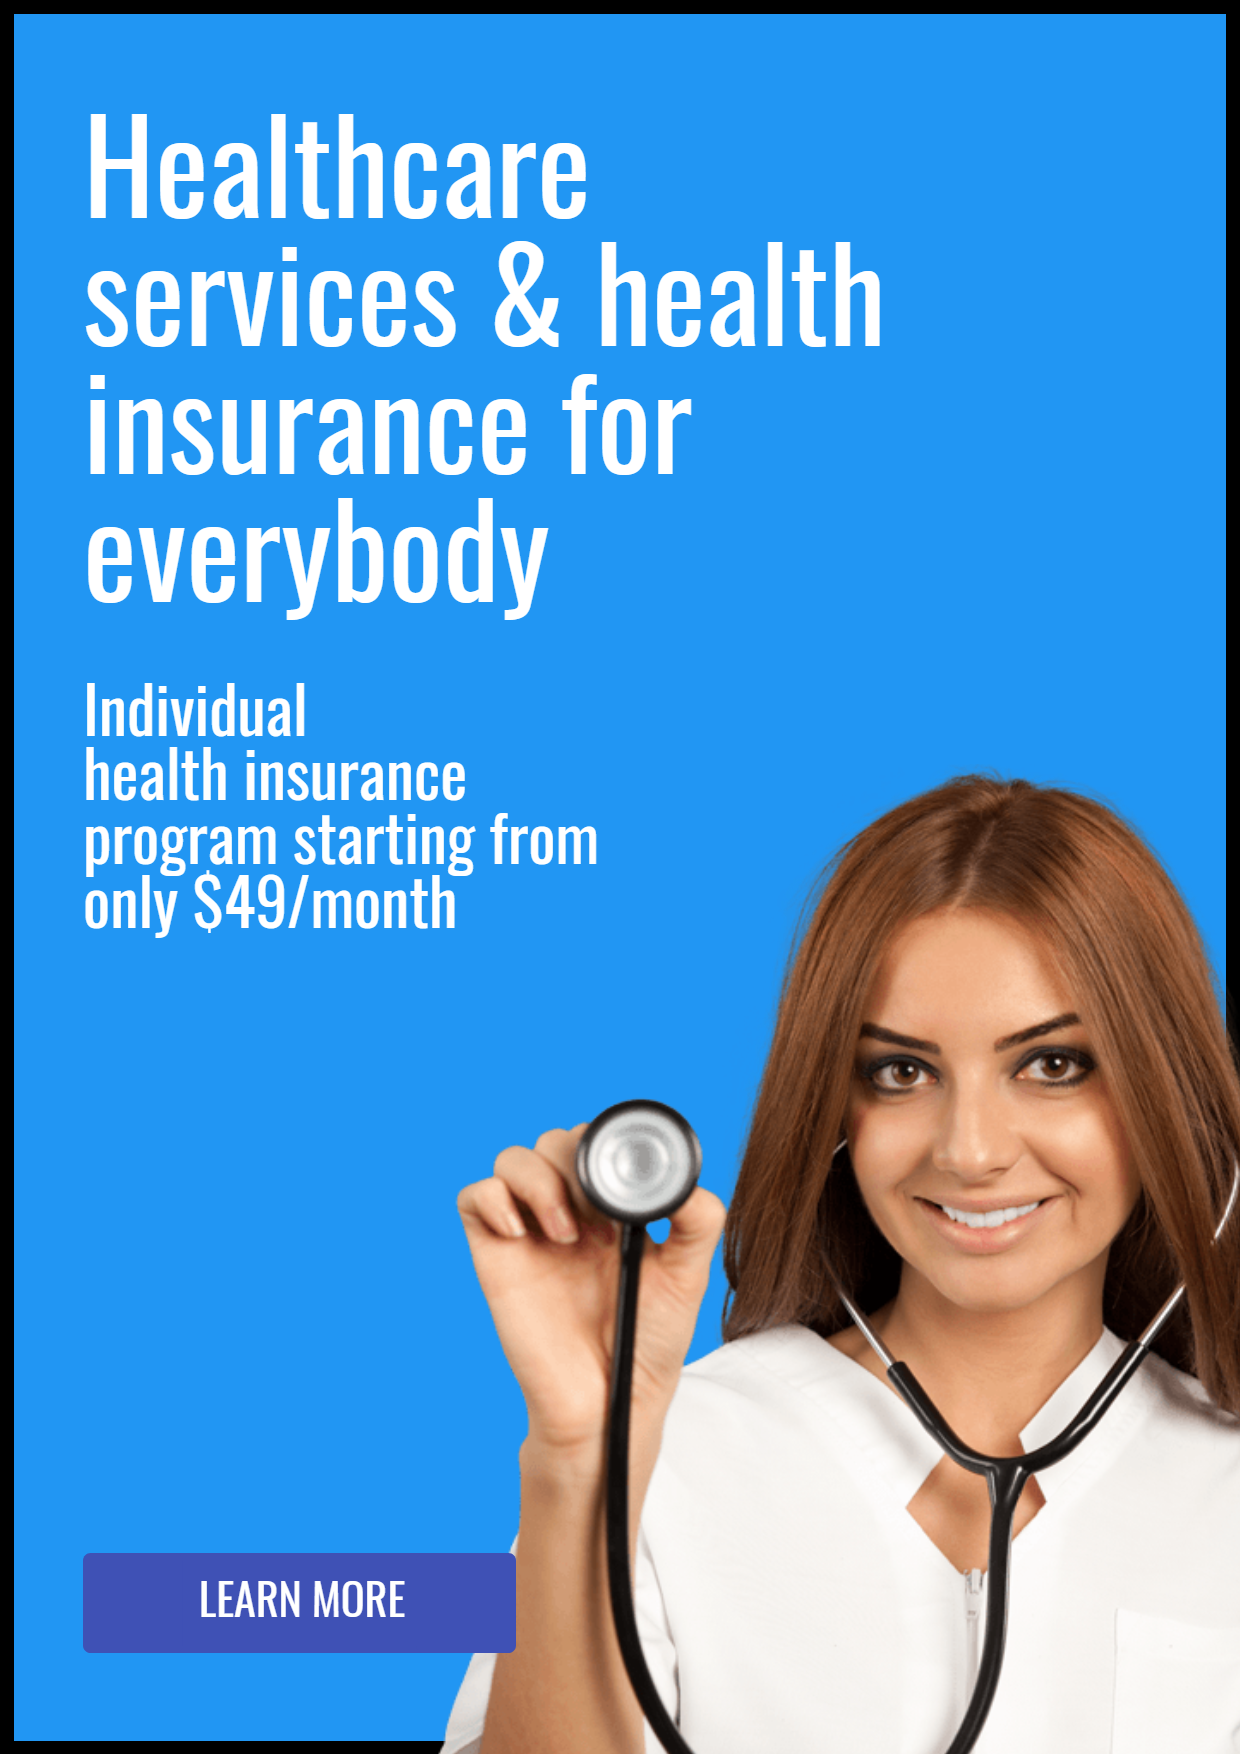 Nice Health Insurance Photo - Easy Design  Template